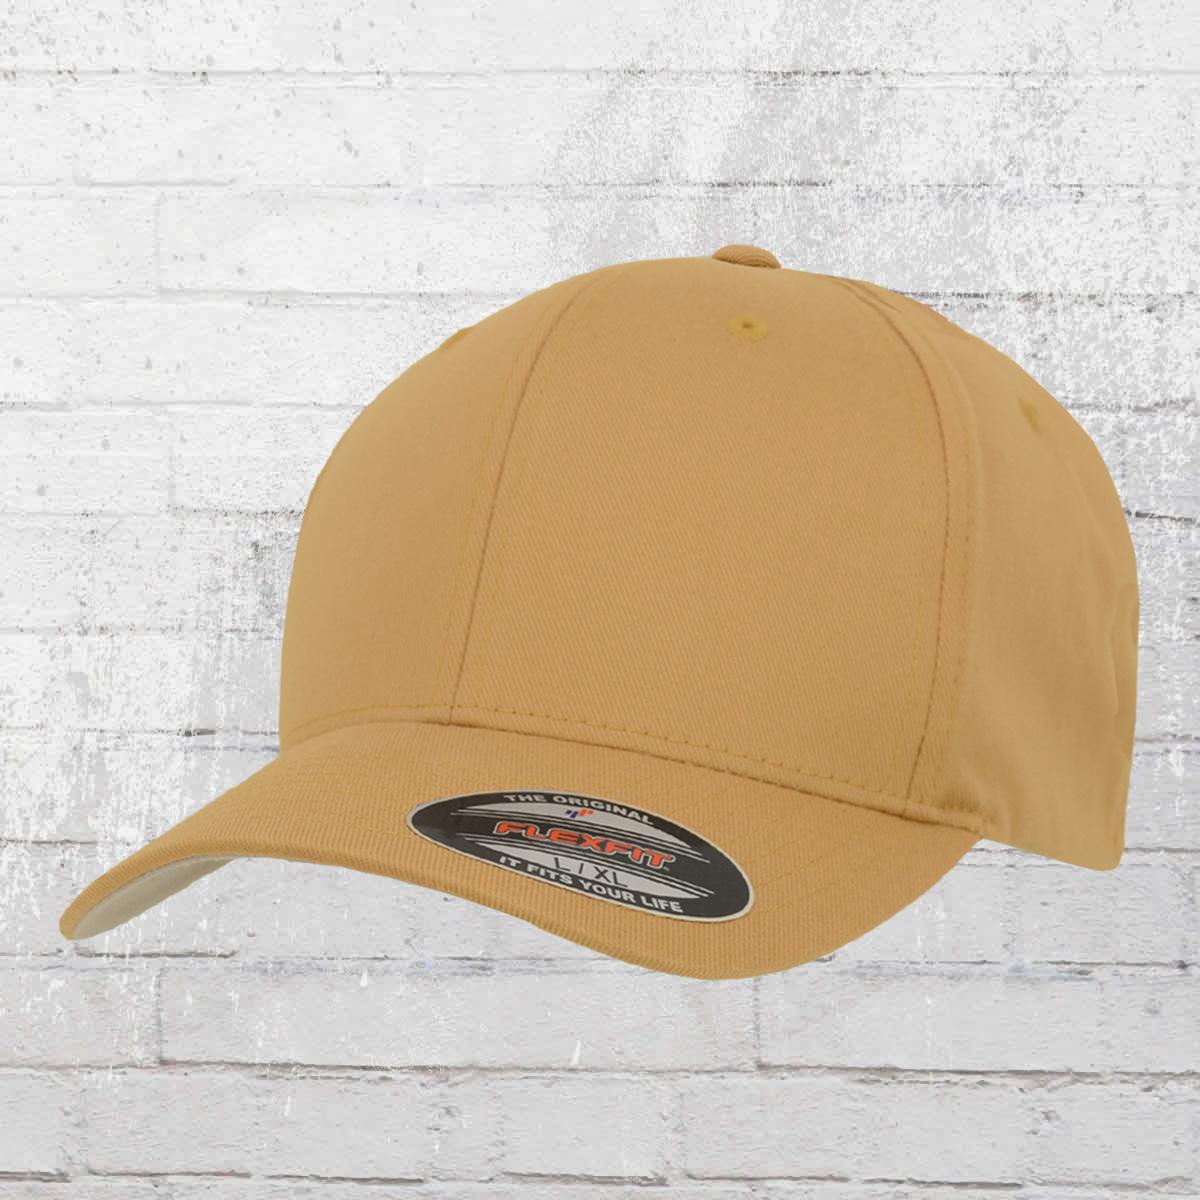 d8d4f94f96 Flexfit Hat Wooly Combed Blanko Cap beige. ›‹ «